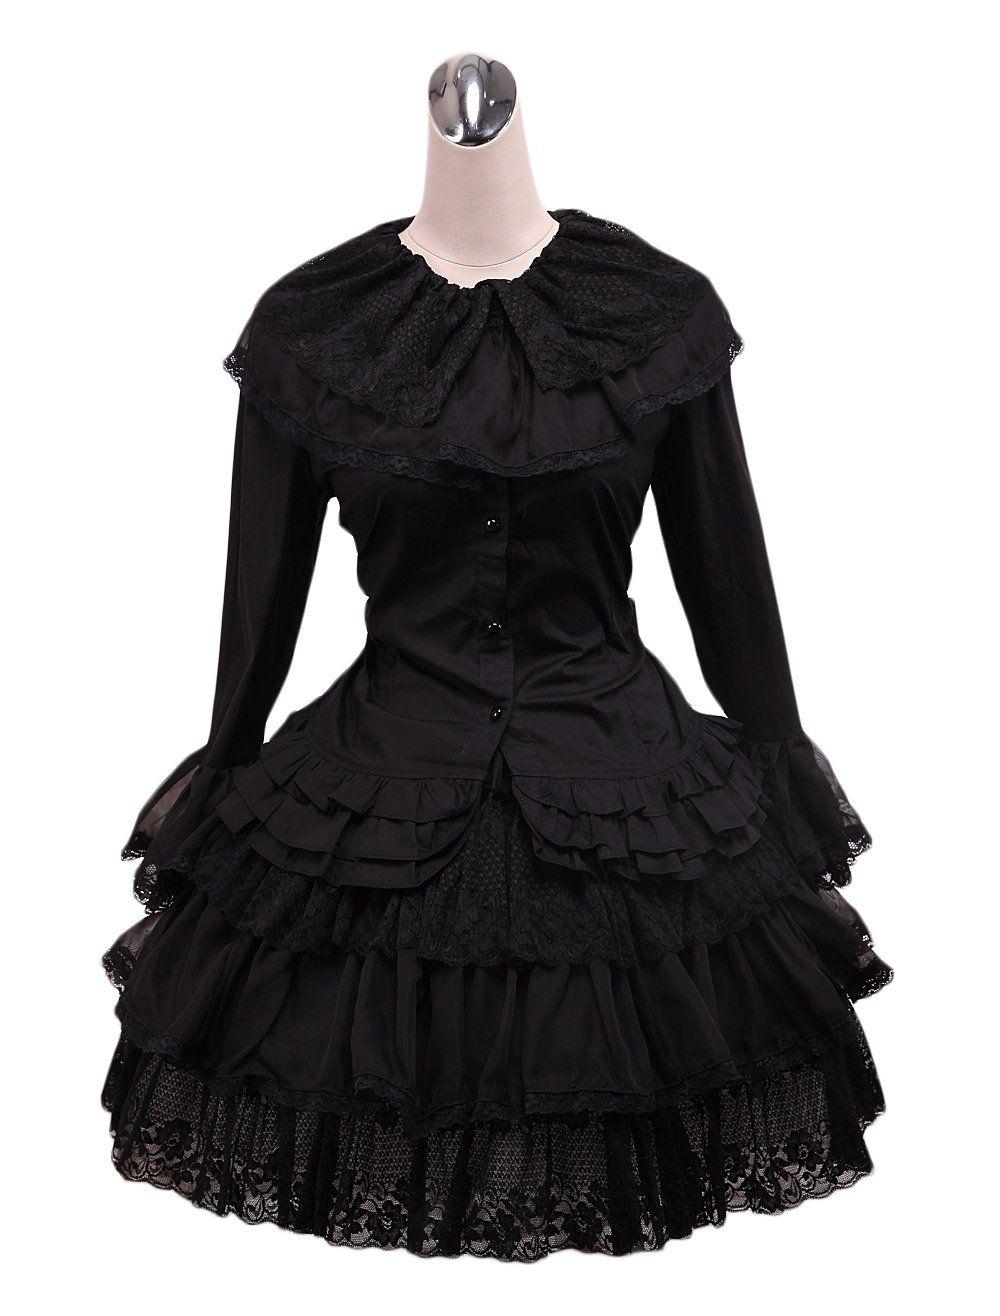 Zkcostume womenus lolita black long sleeve lace ruffles dress for